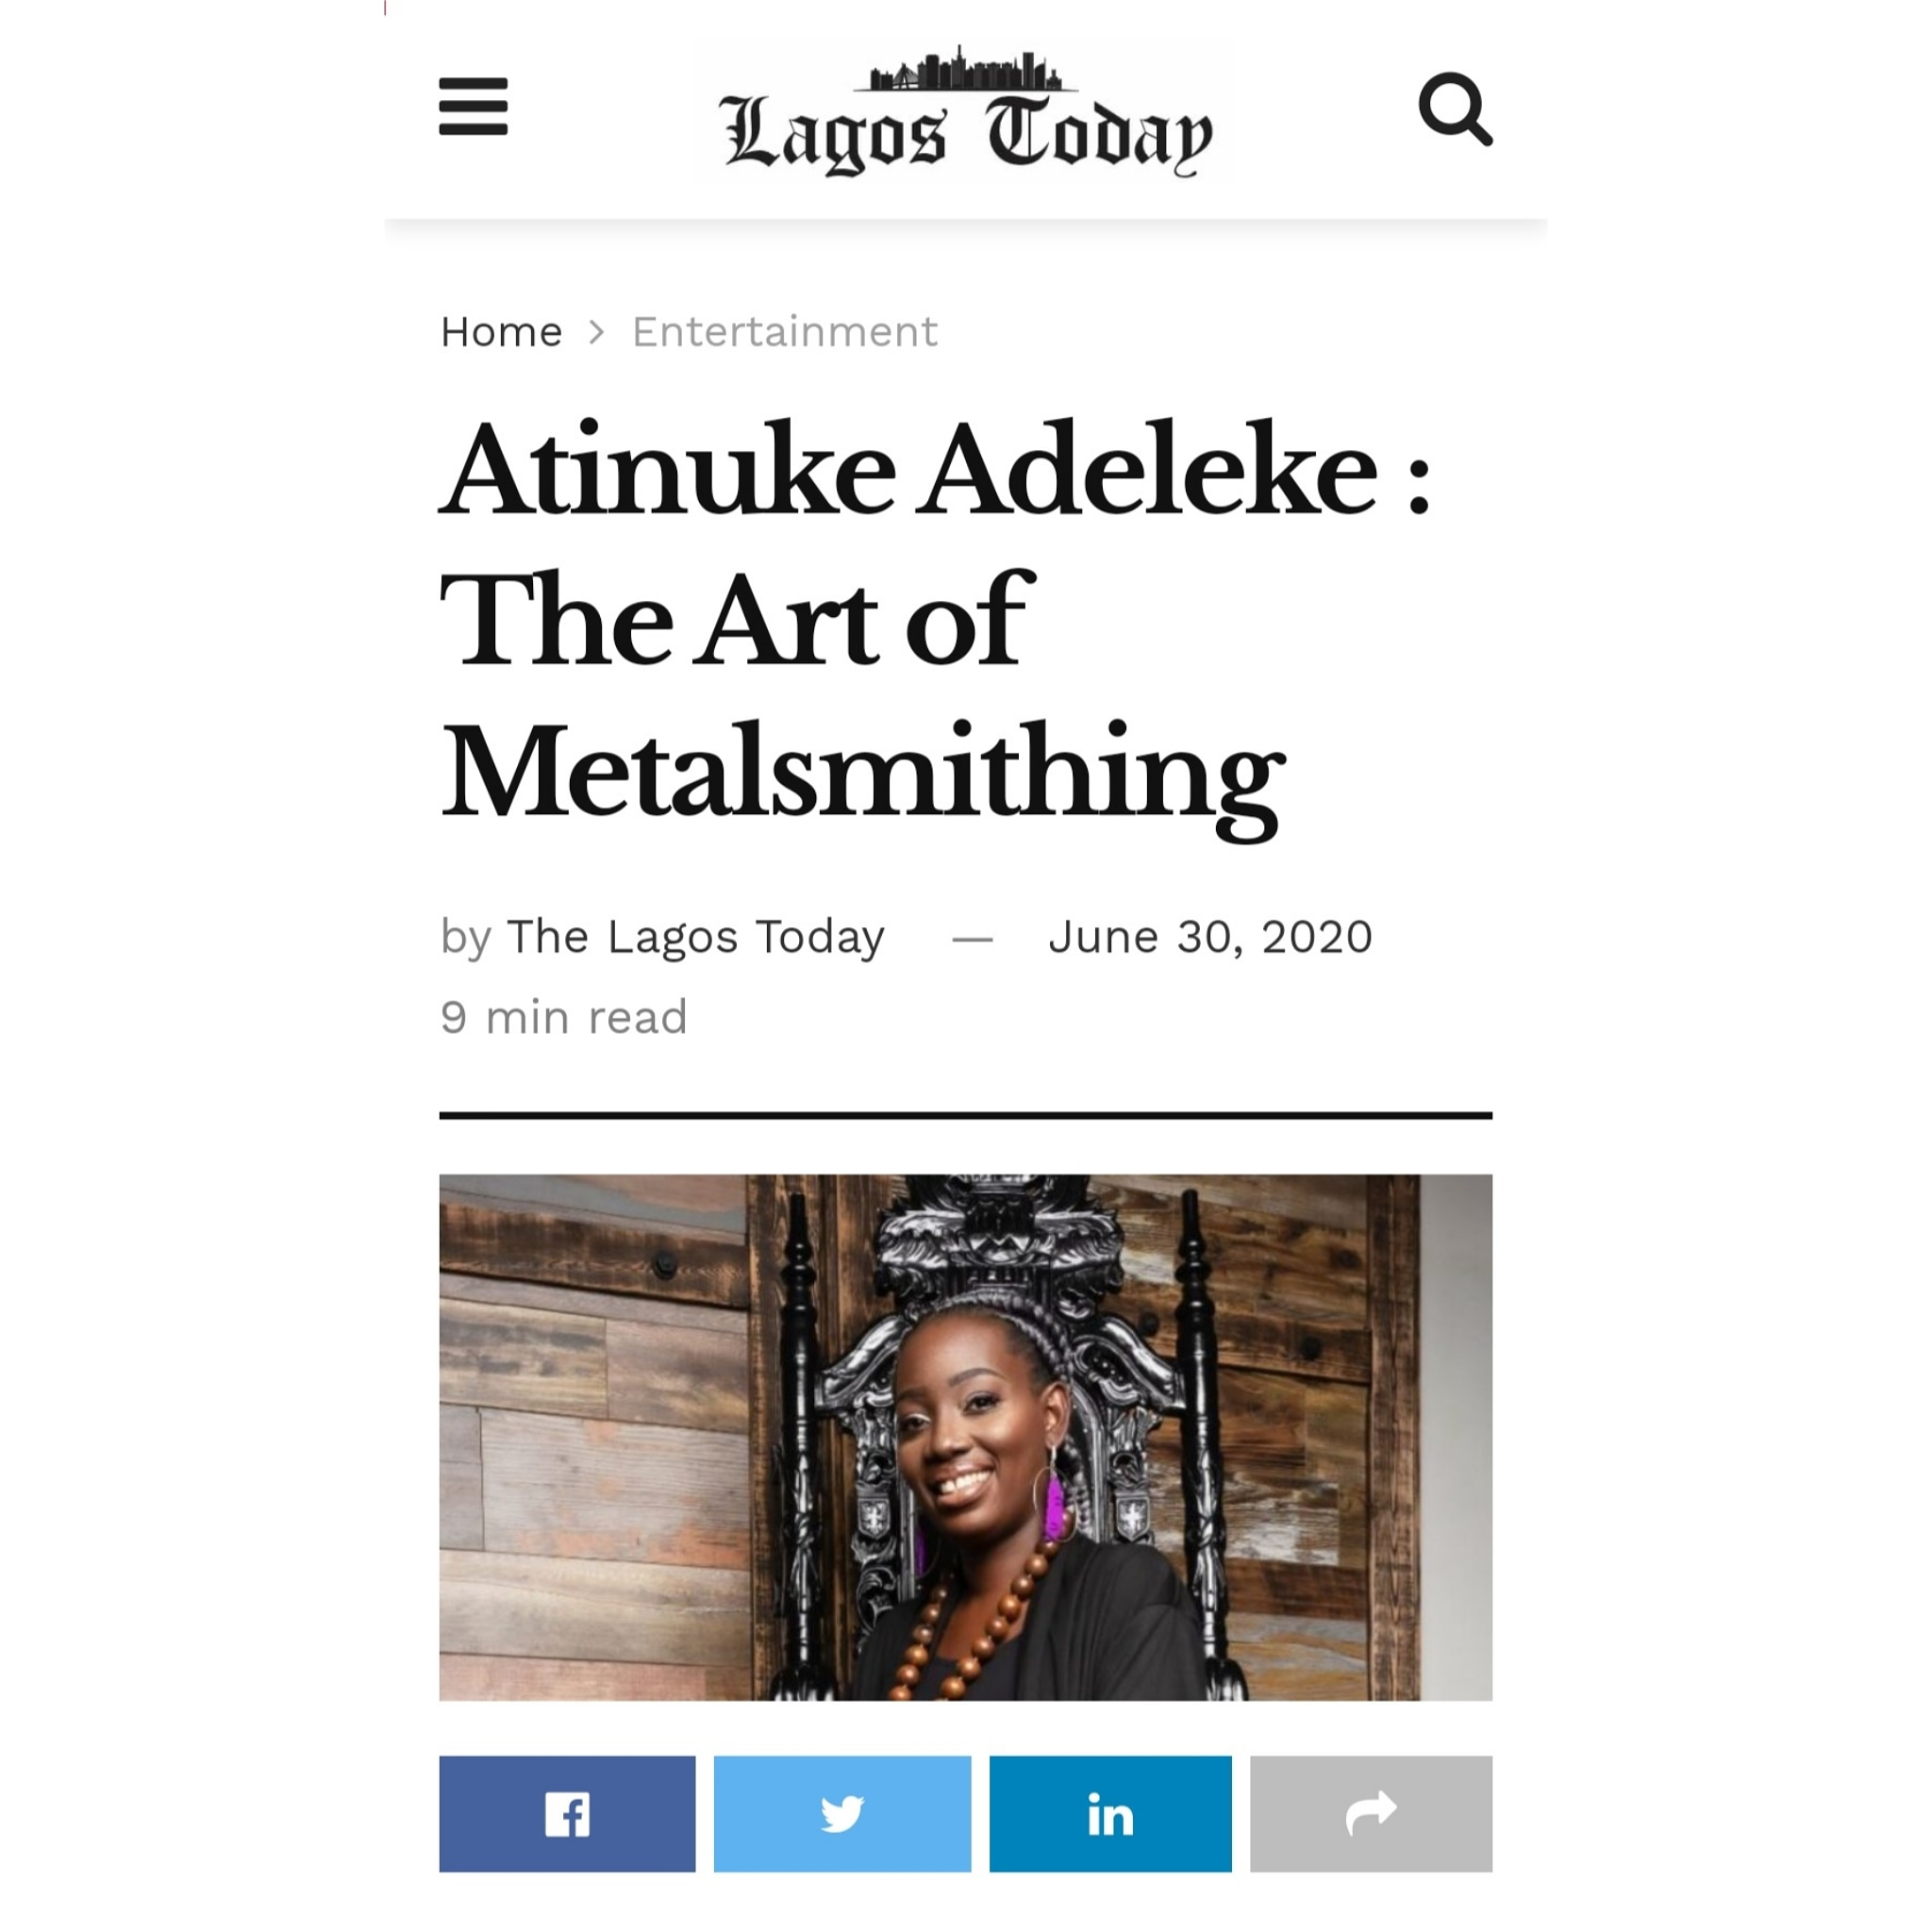 atinuke-adeleke-zuri-perle-interview-with-lagos-today.jpg